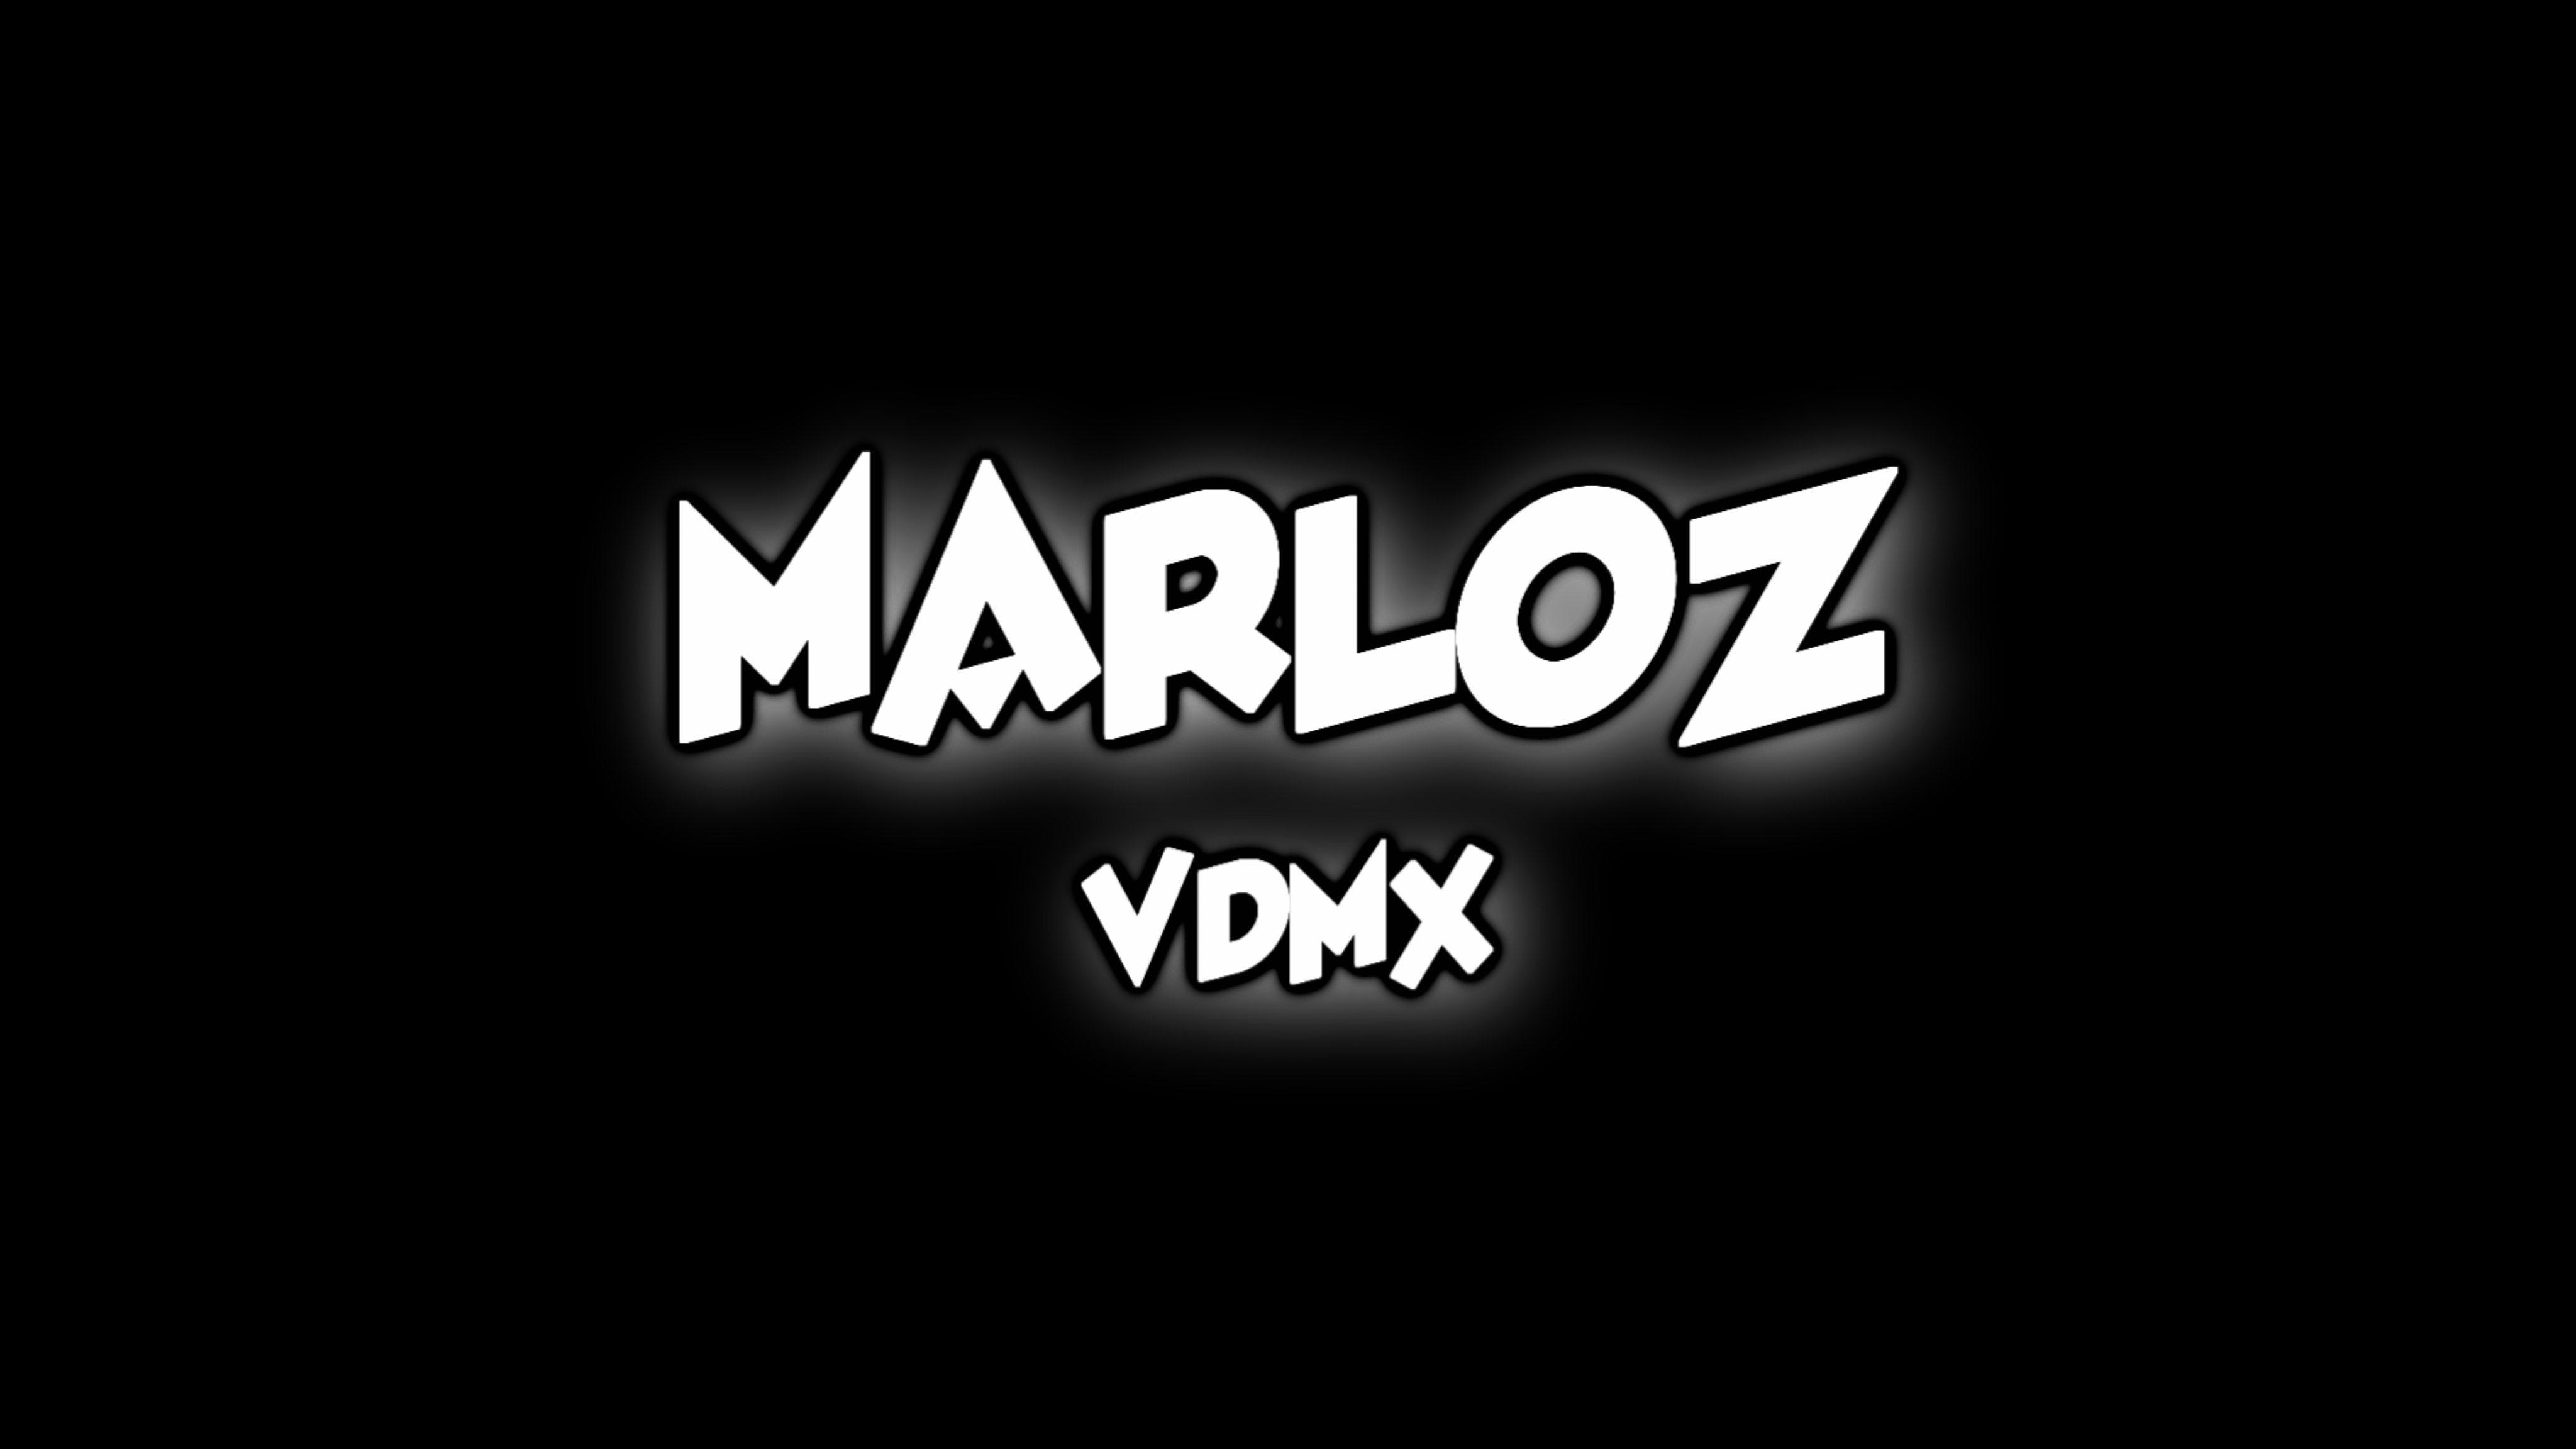 Marloz Videomixes